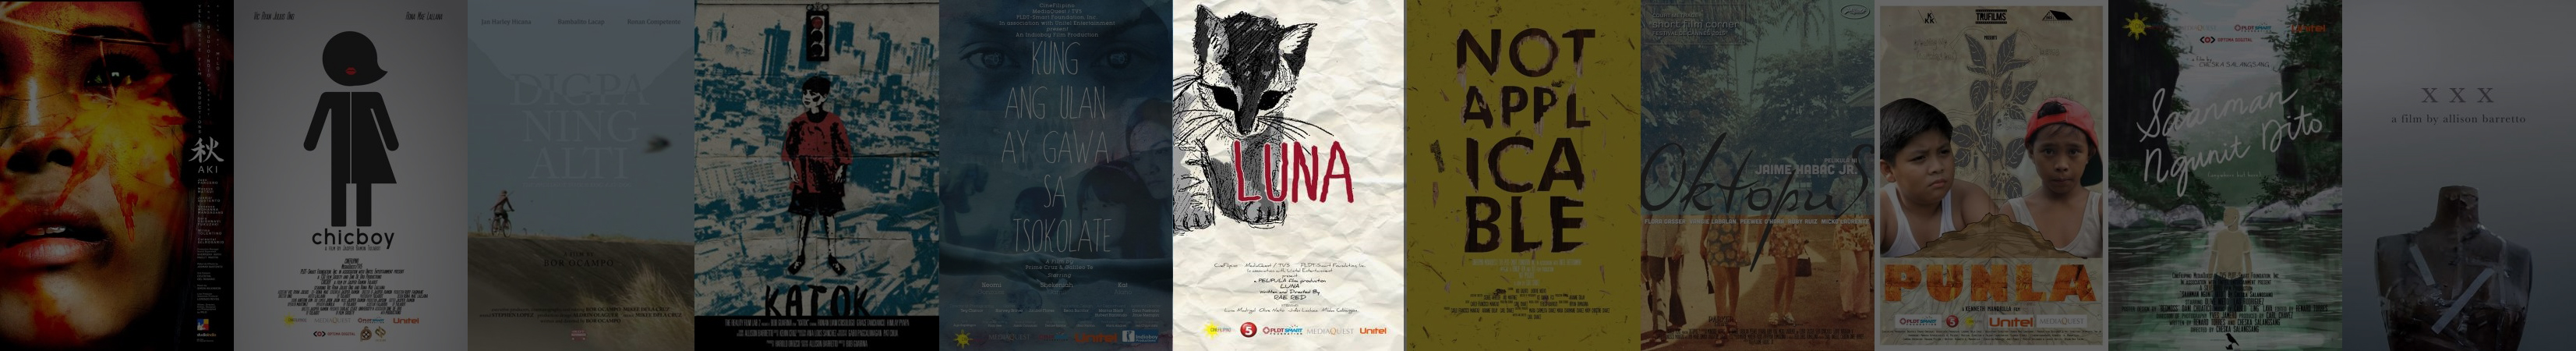 Luna 00